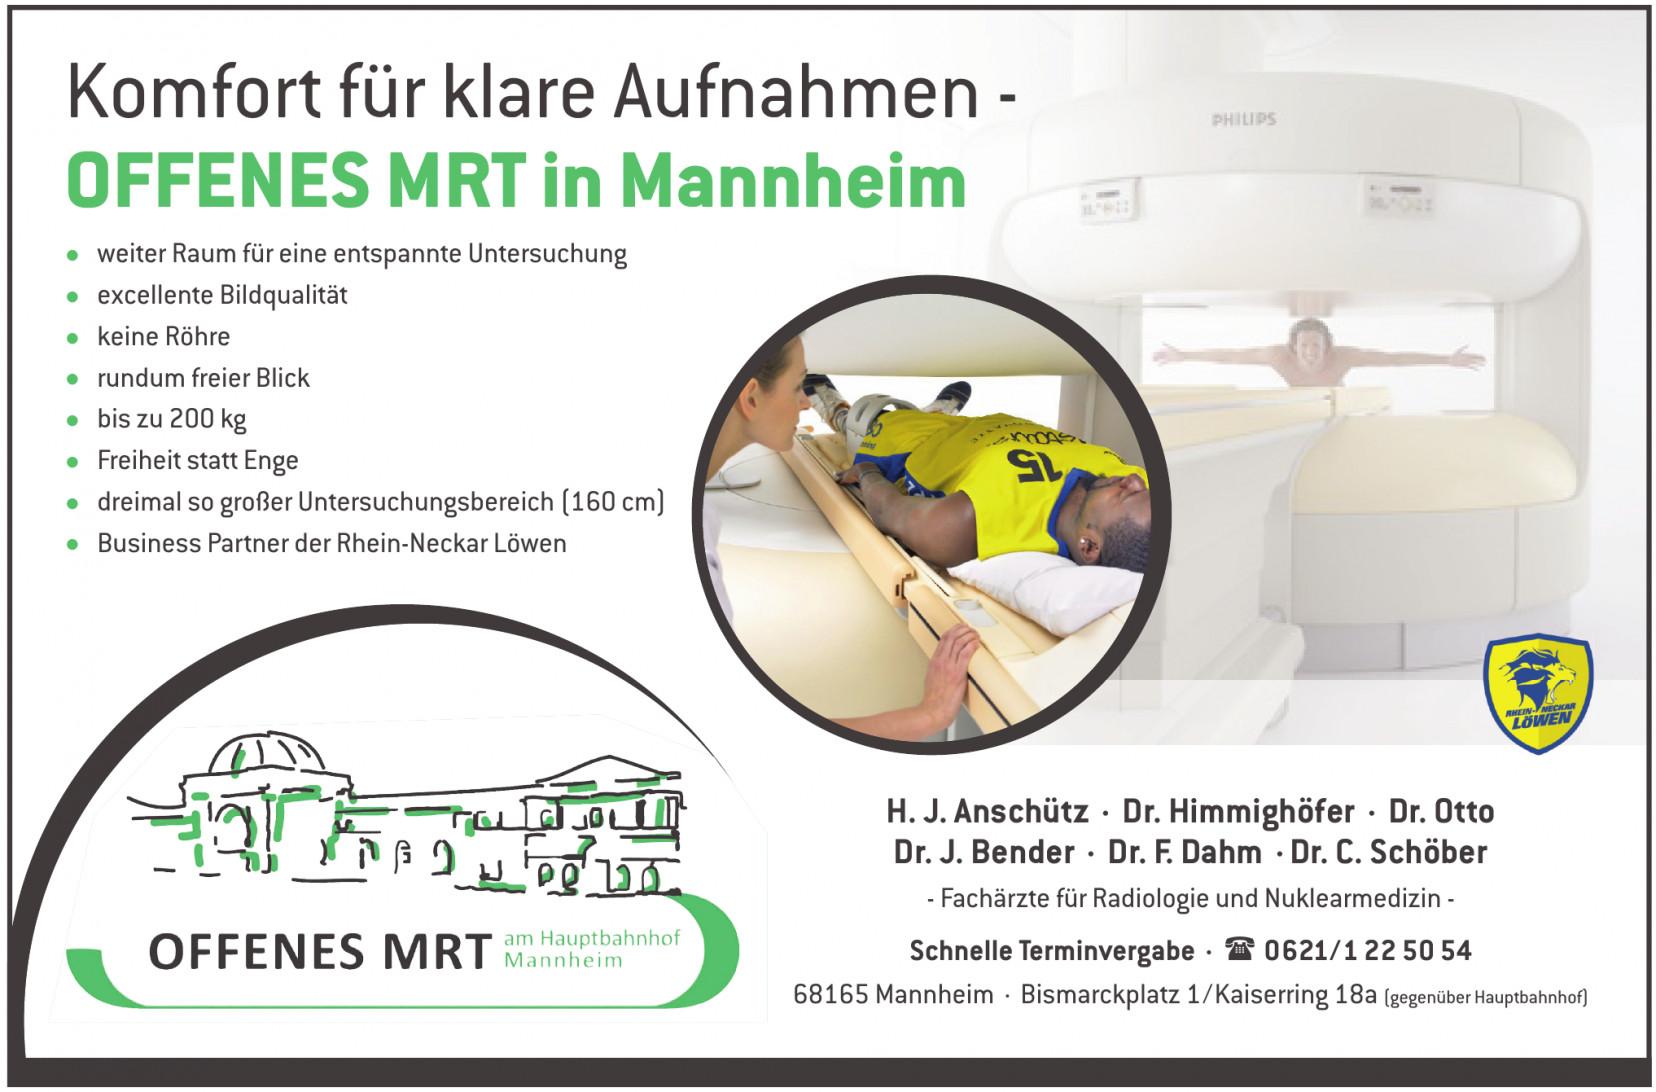 Offenes MRT in Mannheim